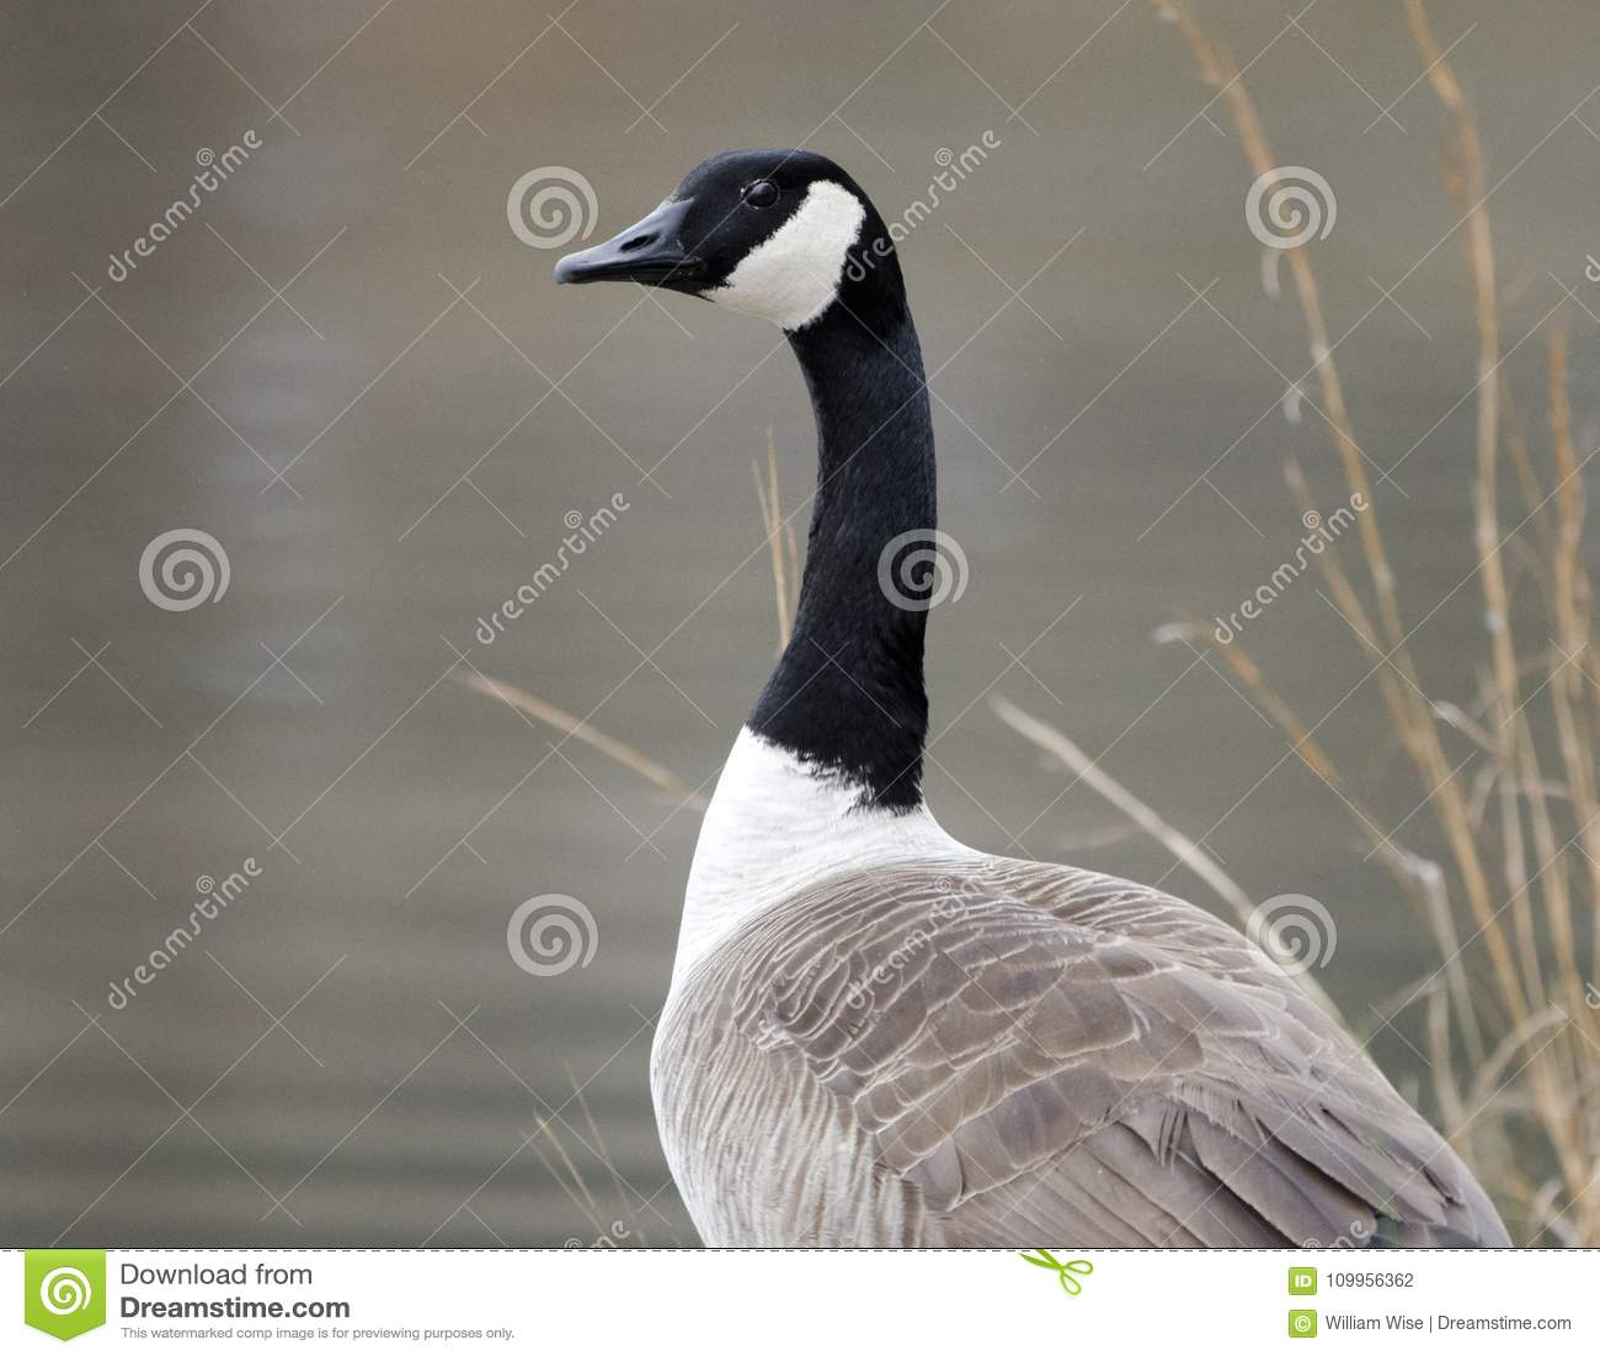 canada goose usa